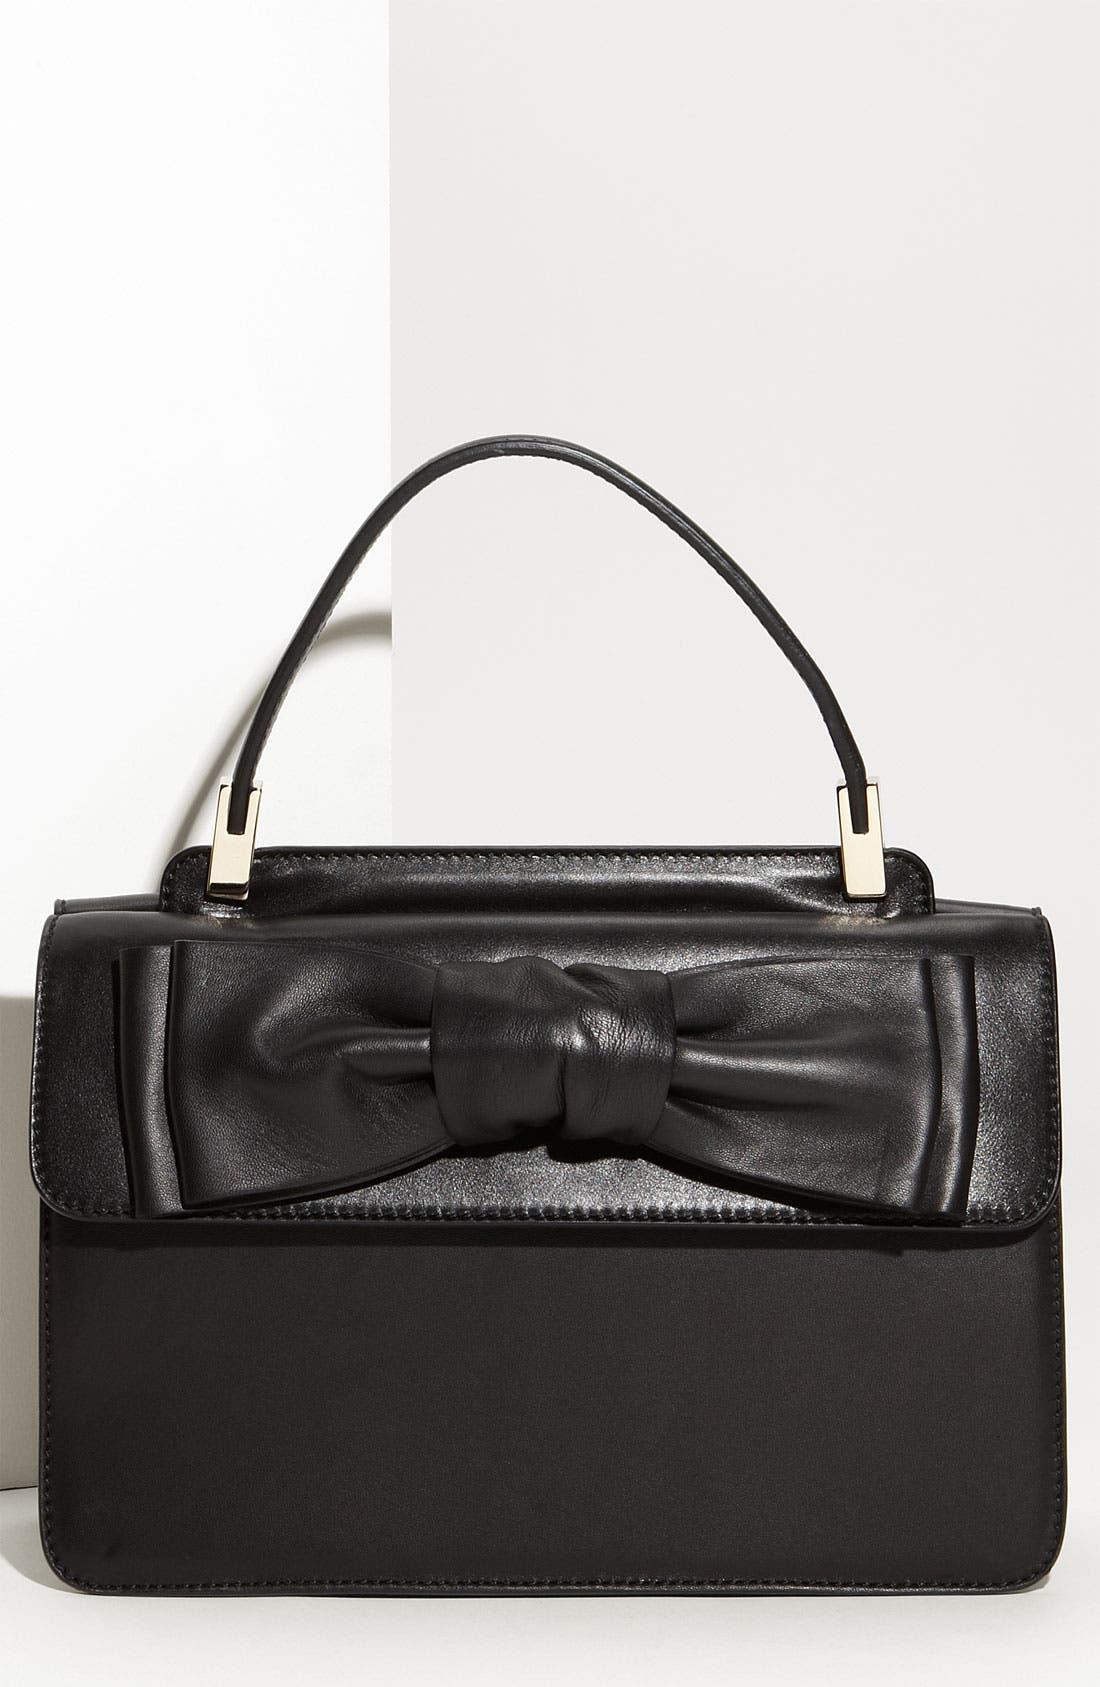 Alternate Image 1 Selected - Valentino 'Aphrodite - Small' Leather Shopper